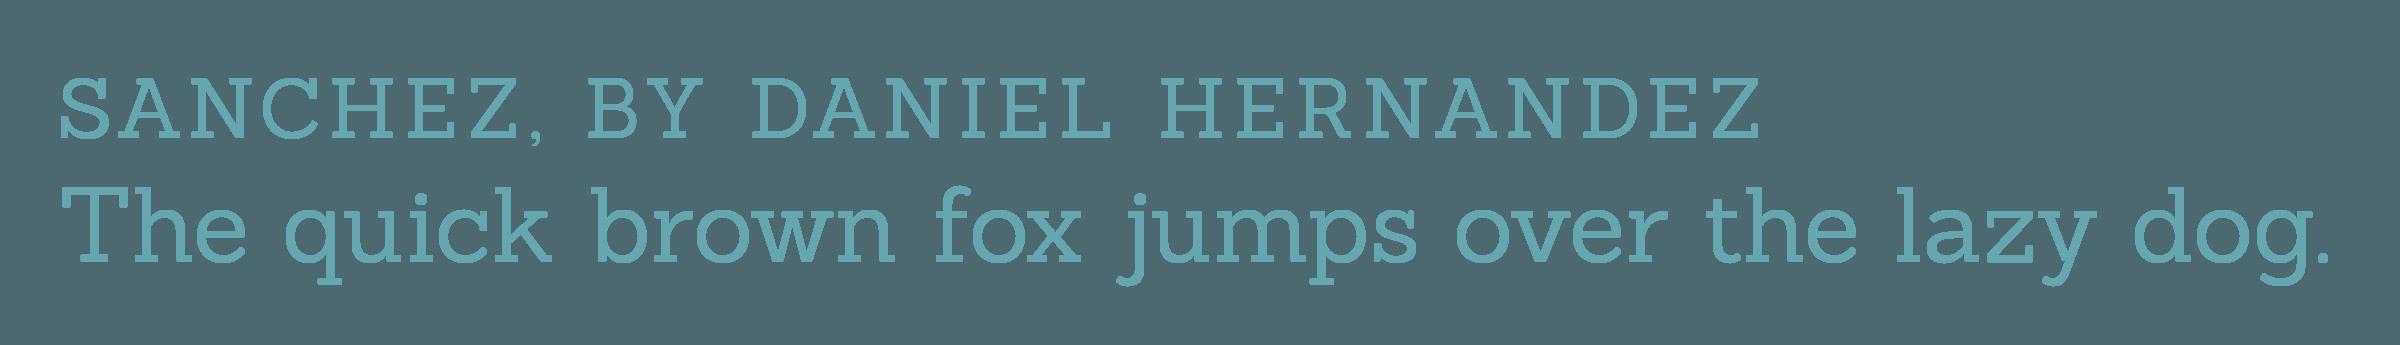 12 Great Free Google Fonts  |  Hue & Tone Creative